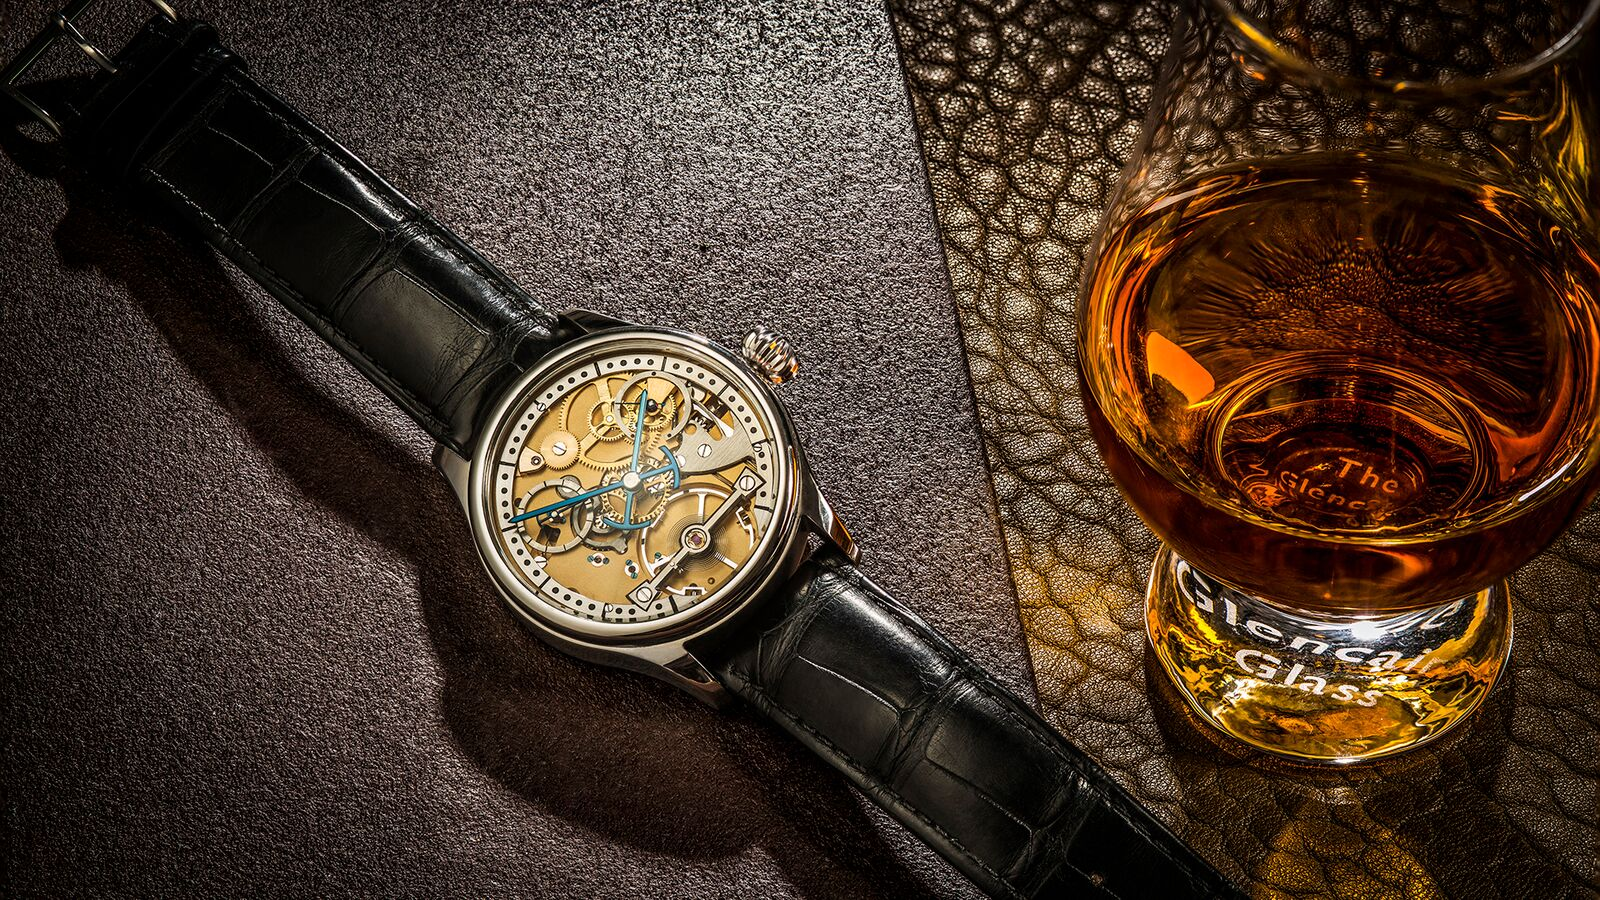 garrick-S1-whiskey-1.jpeg